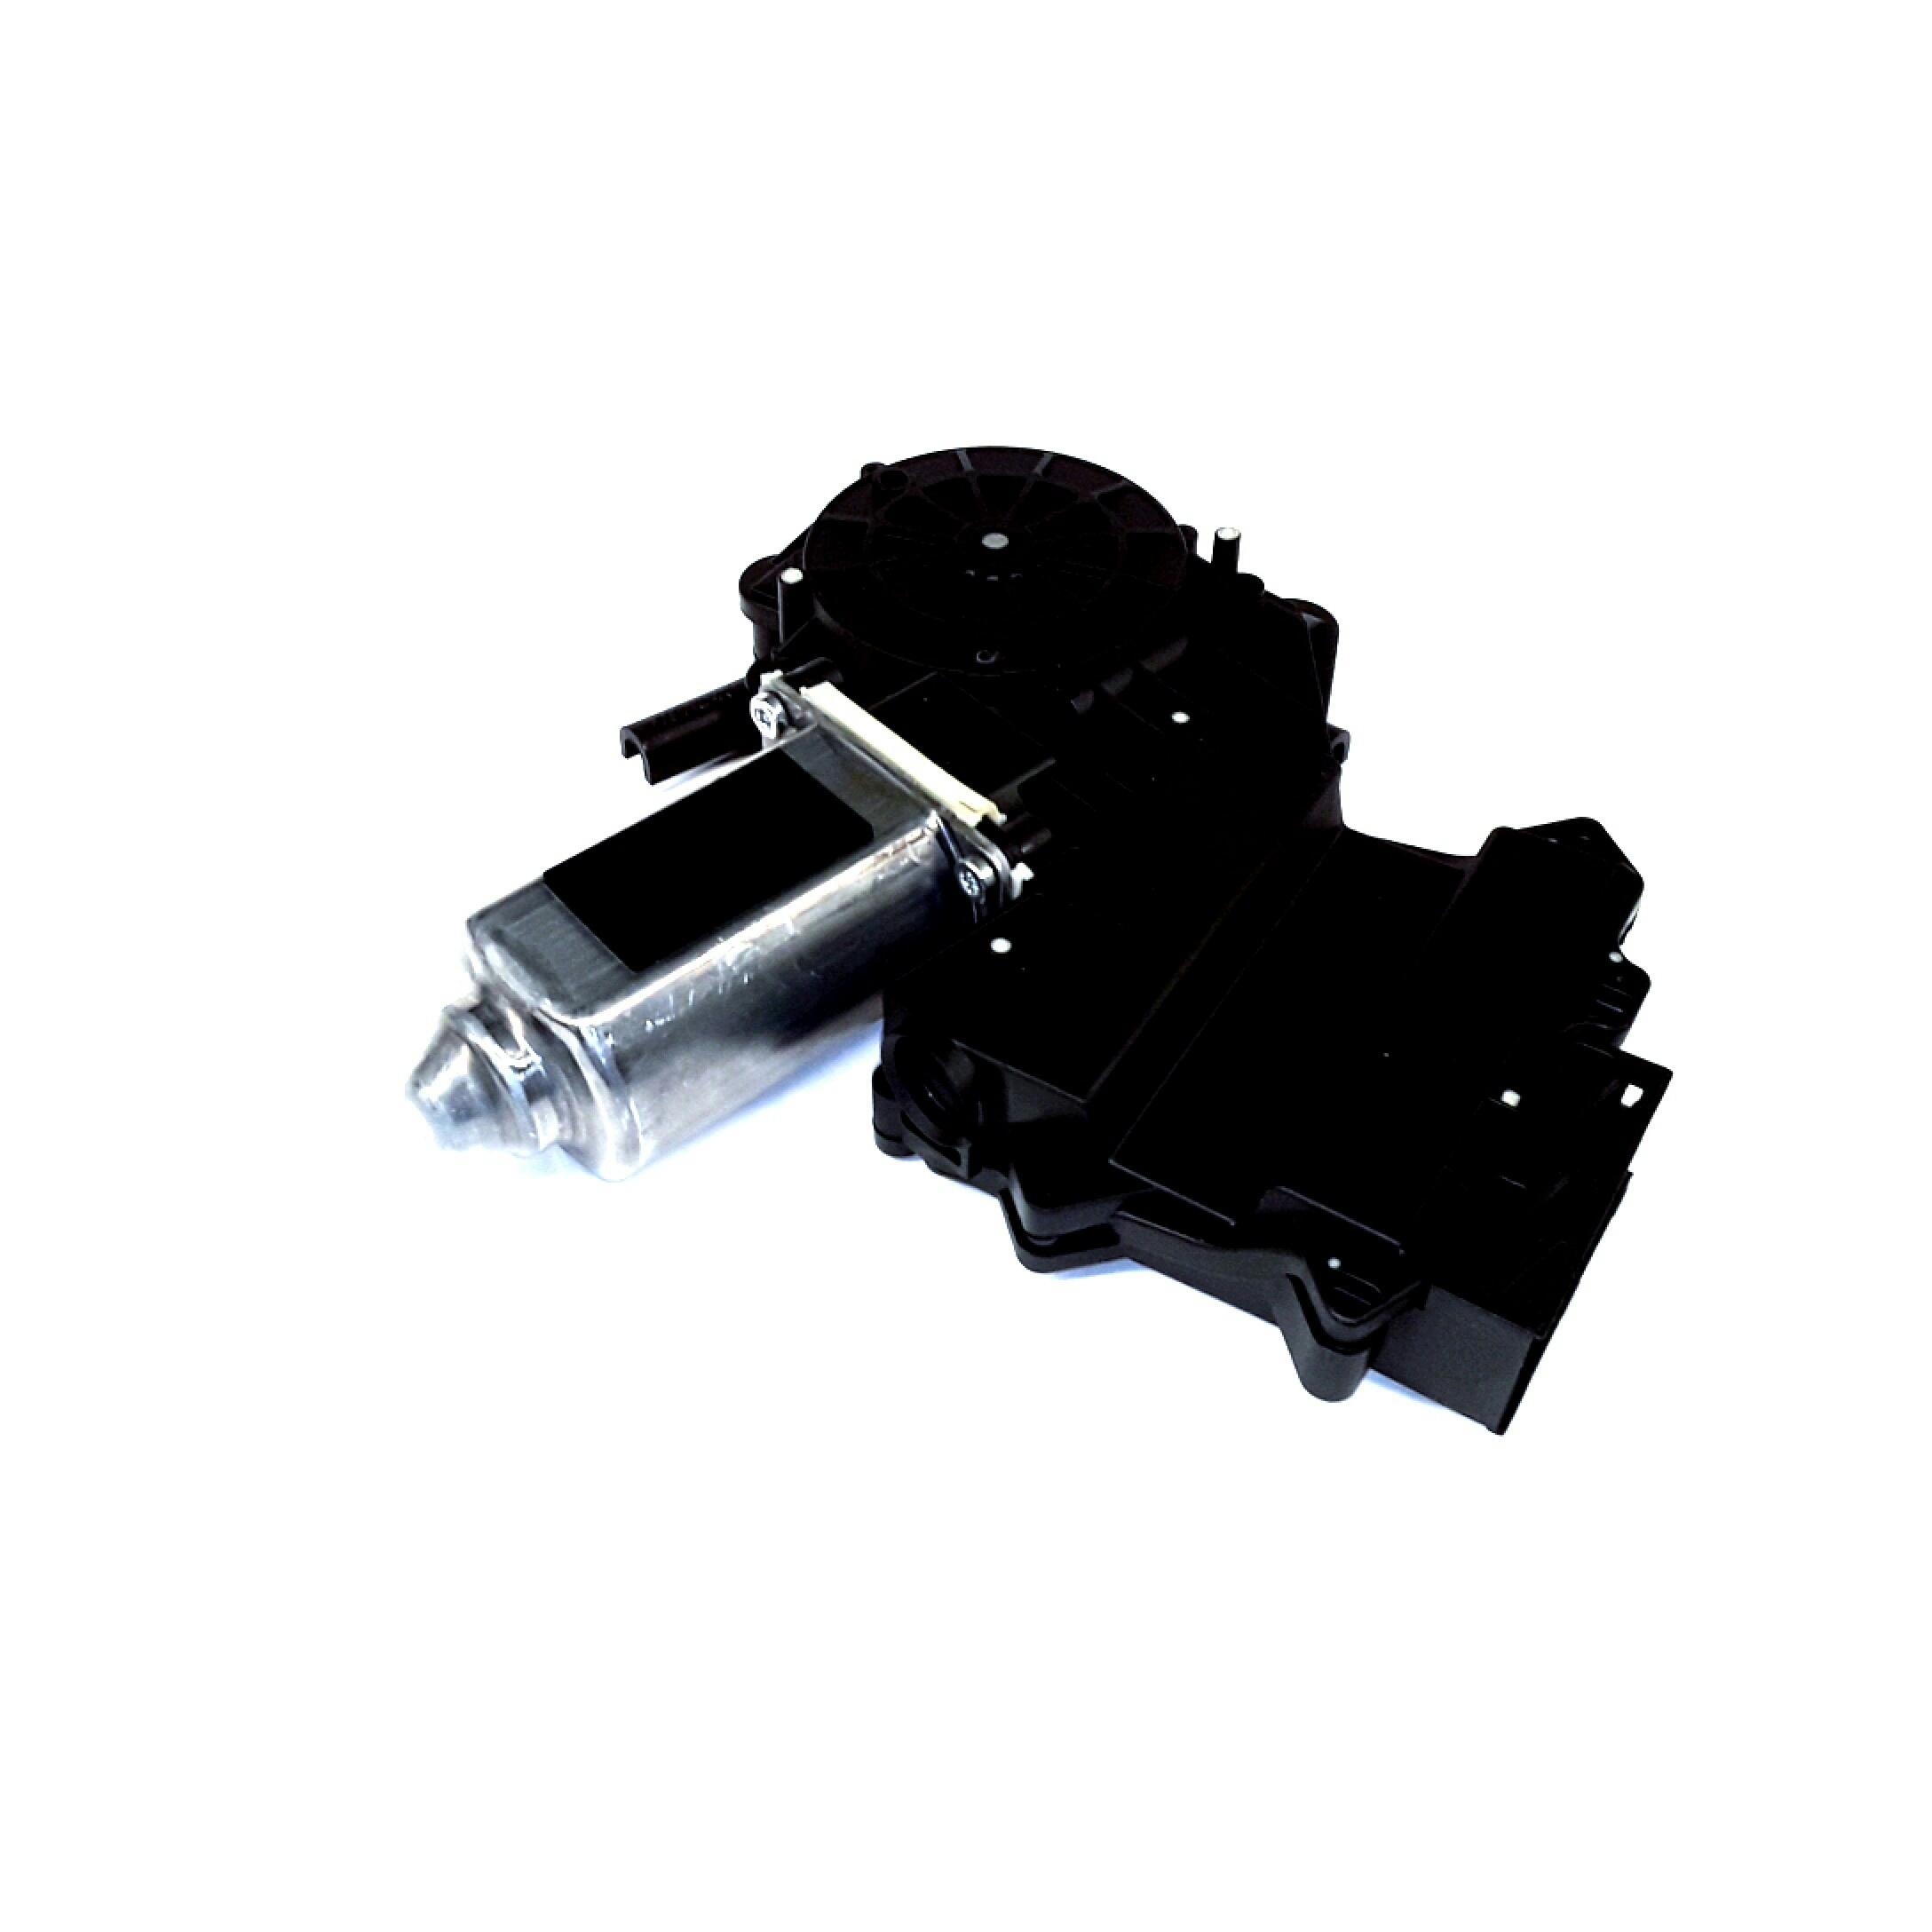 2000 volkswagen cabrio power window motor window motor for 2000 vw cabrio window regulator